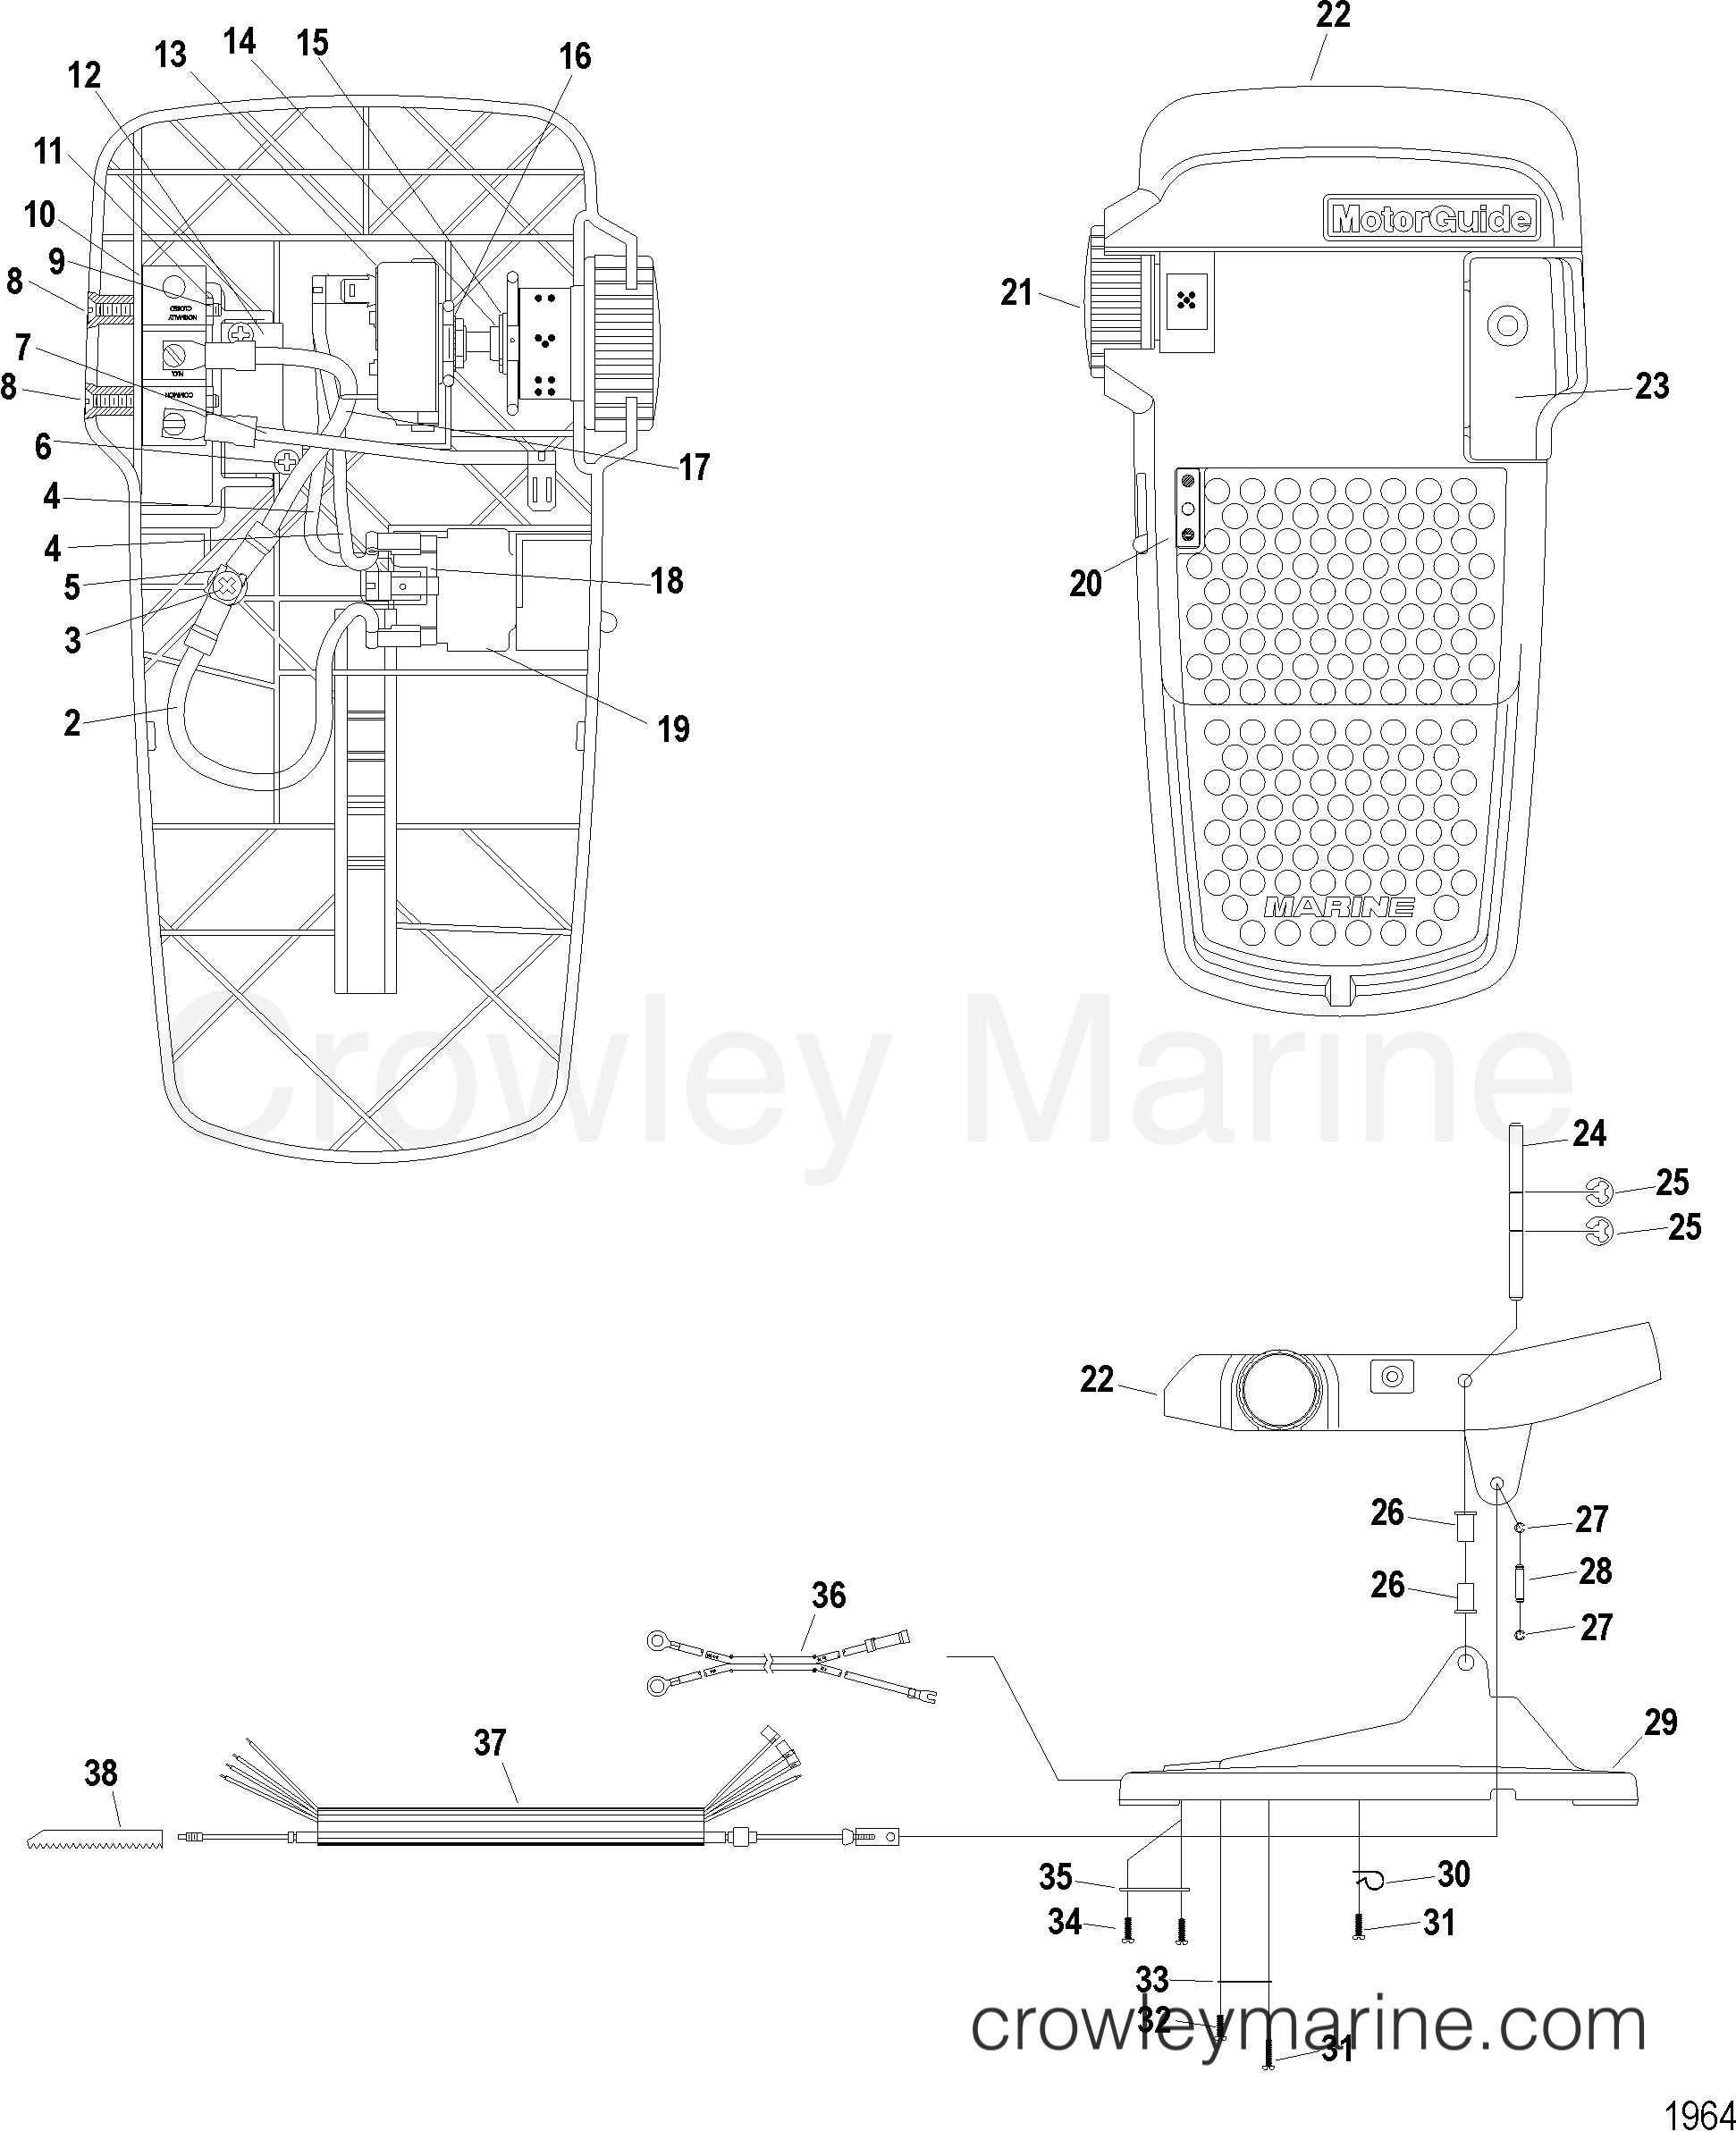 KJ3zY1KV foot pedal assembly(mlp300912) 2000 motorguide 12v [motorguide motorguide foot pedal wiring diagram at webbmarketing.co